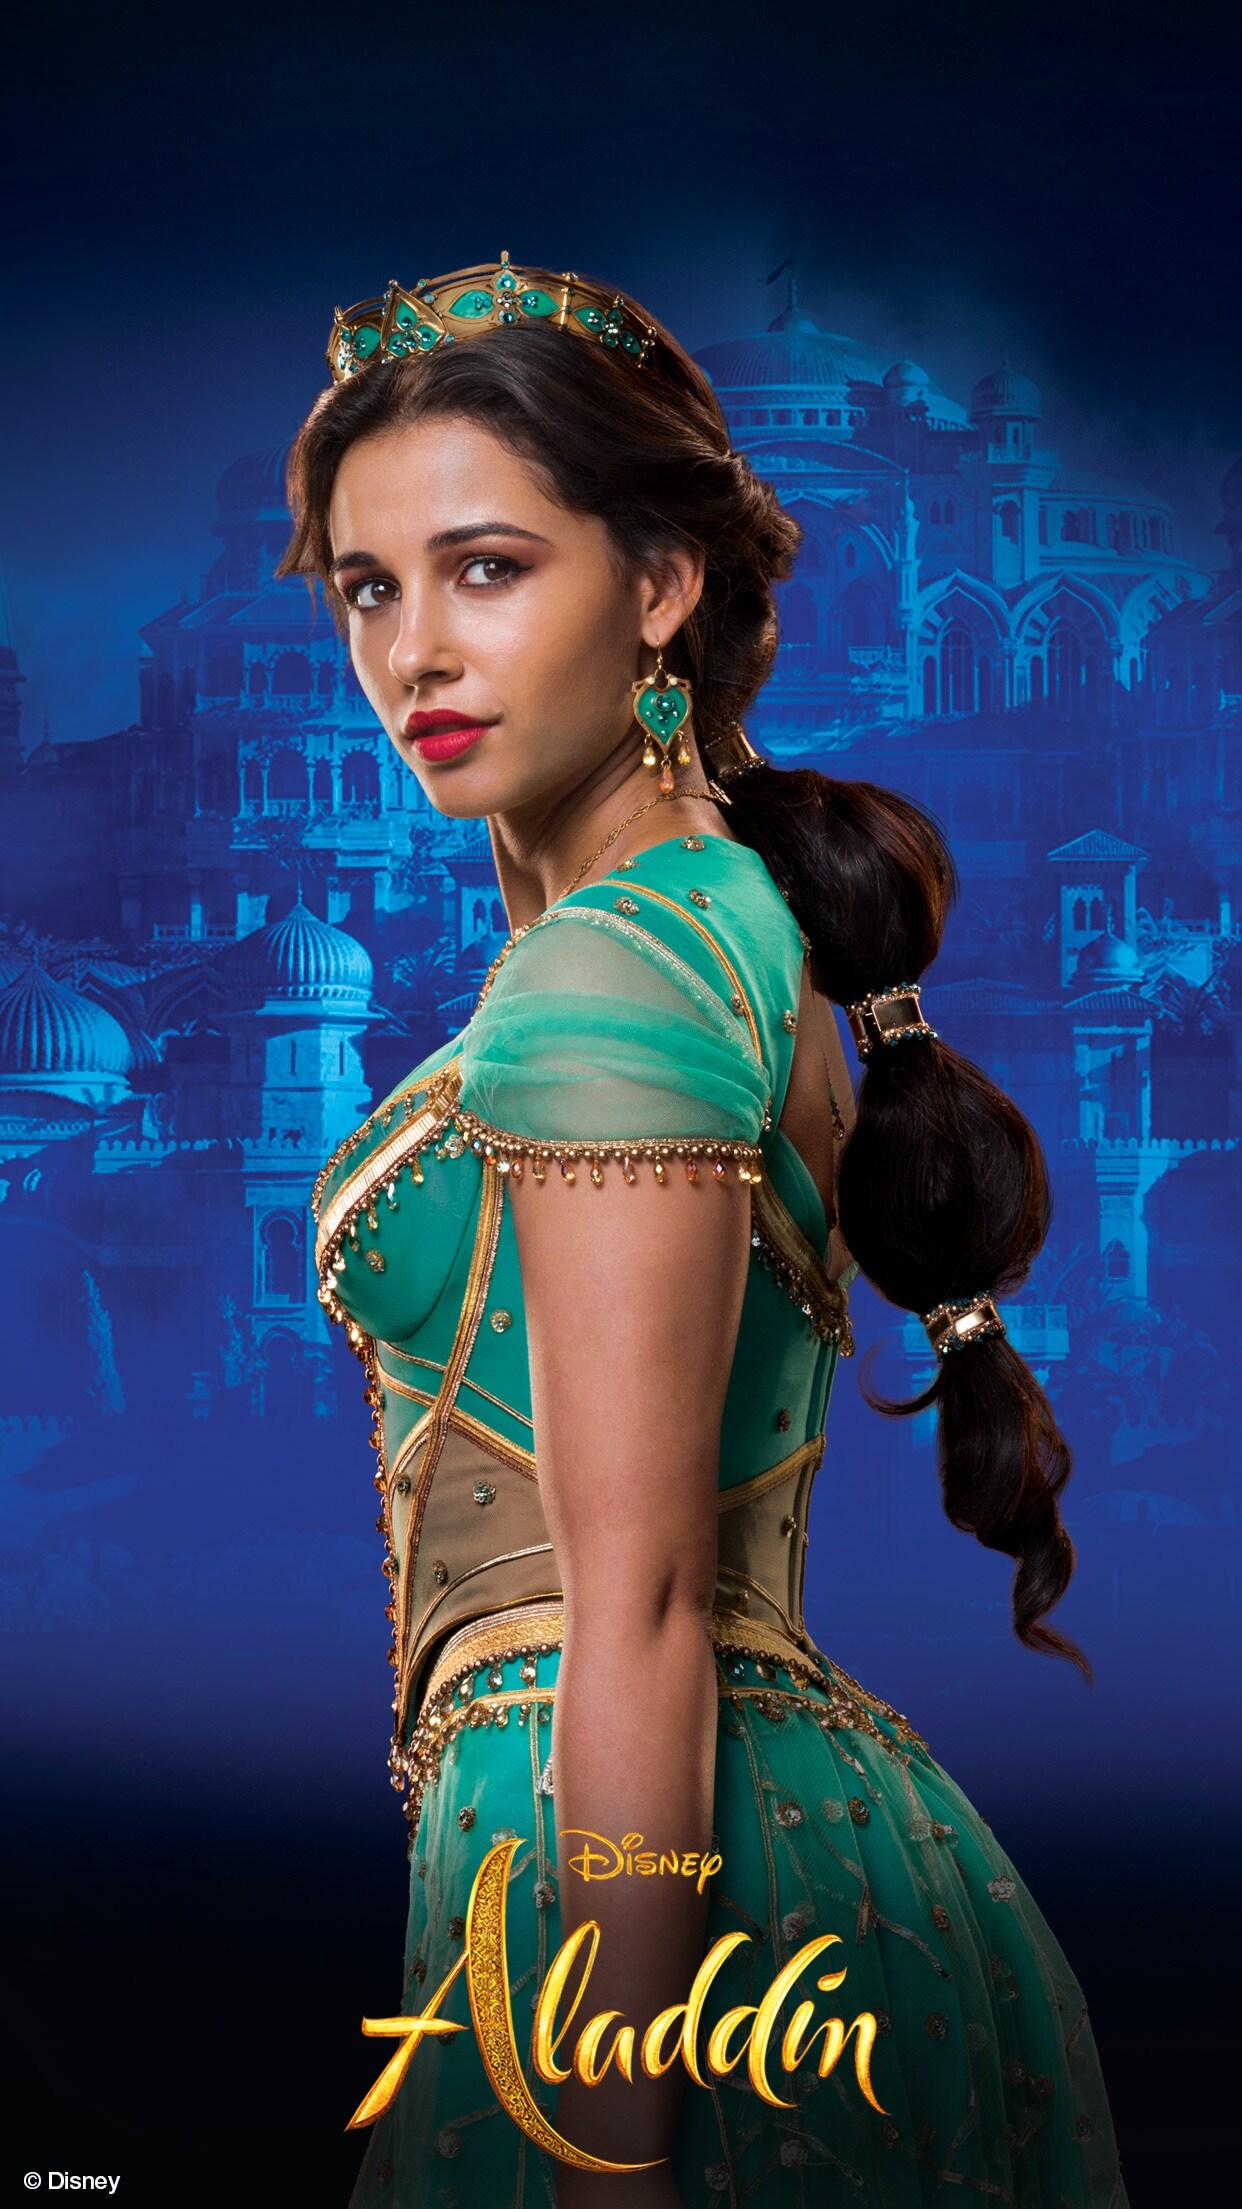 Aladdin Mobile Wallpapers Disney Malaysia